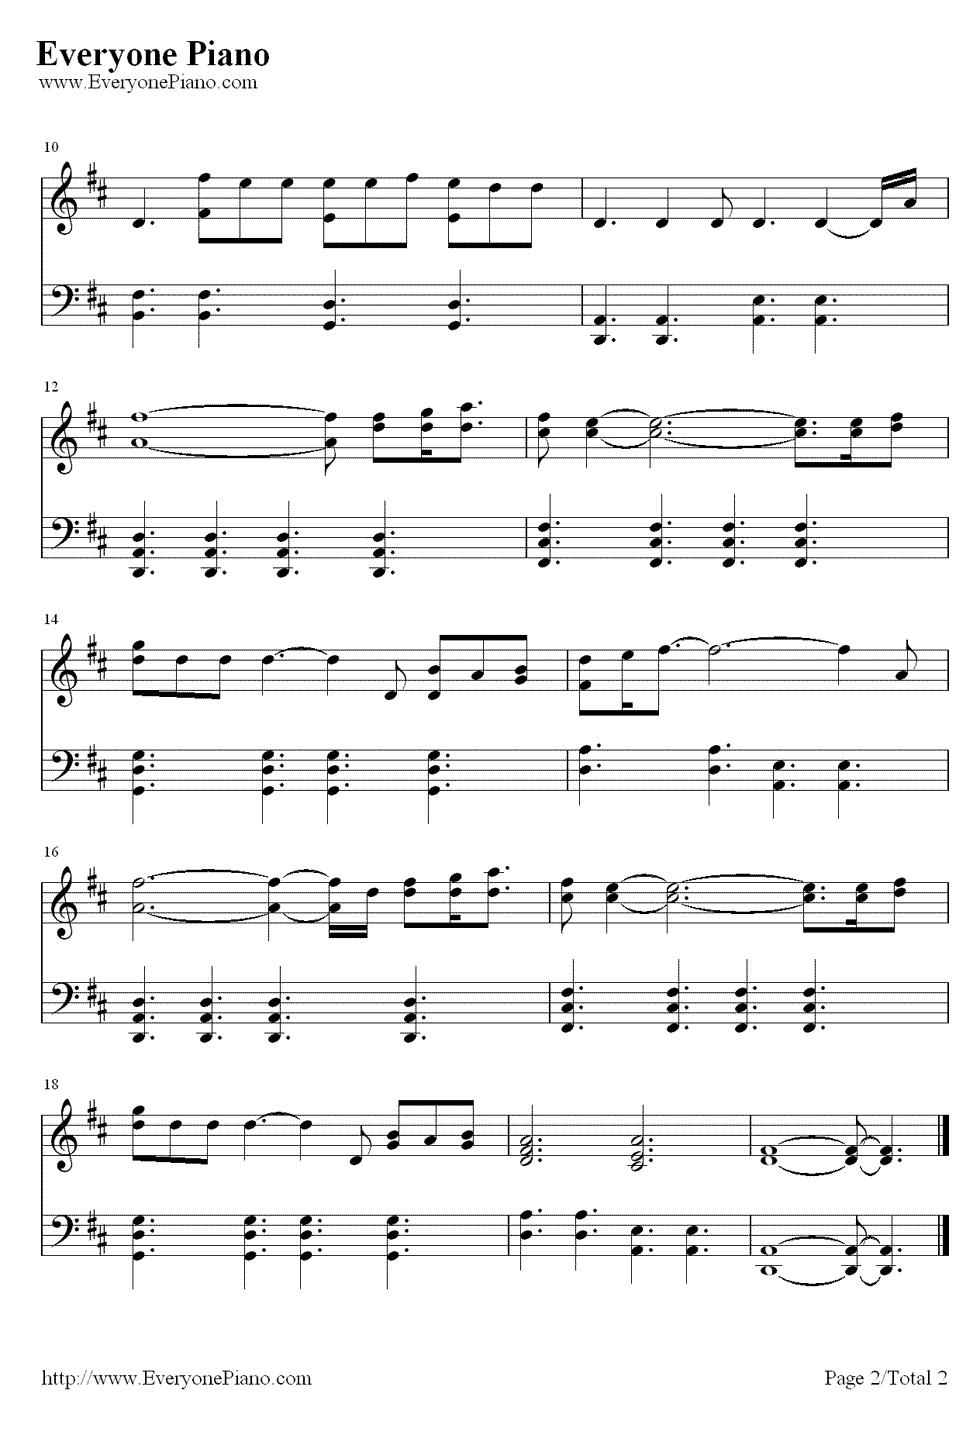 somethingjust钢琴谱_say something 钢琴五线谱